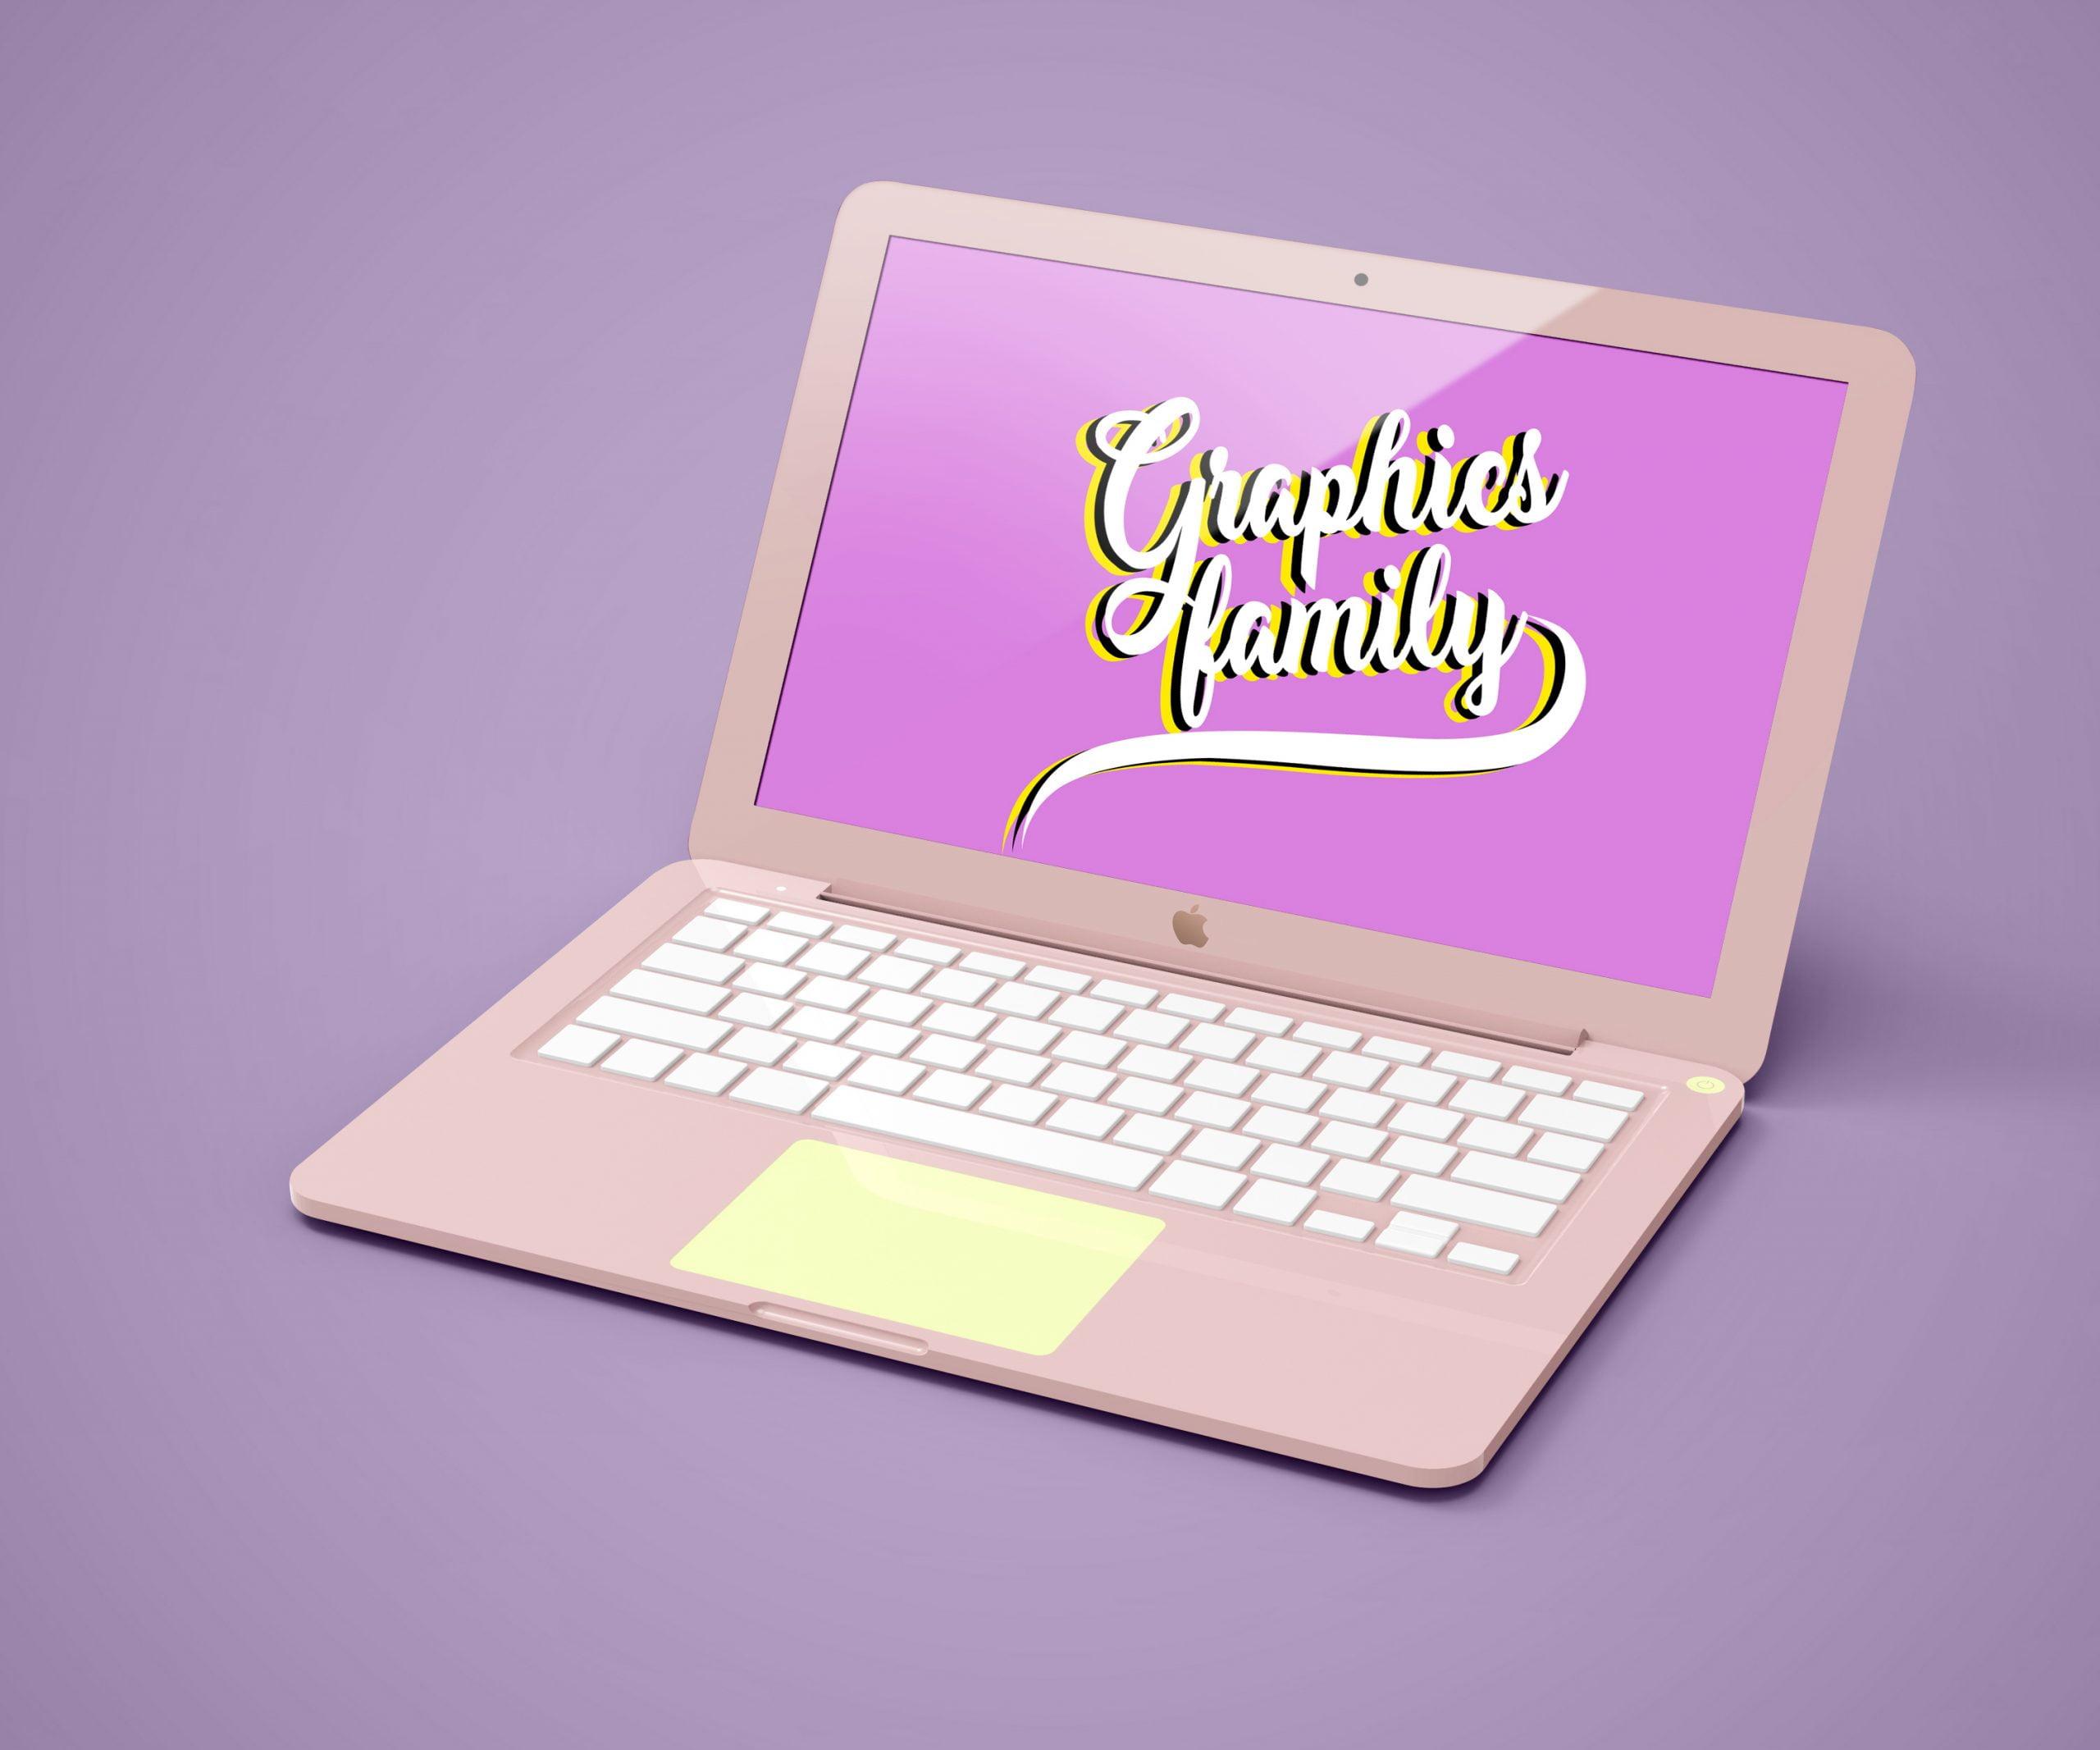 GraphicsFamily-Free-Macbook-Pro-Mockup